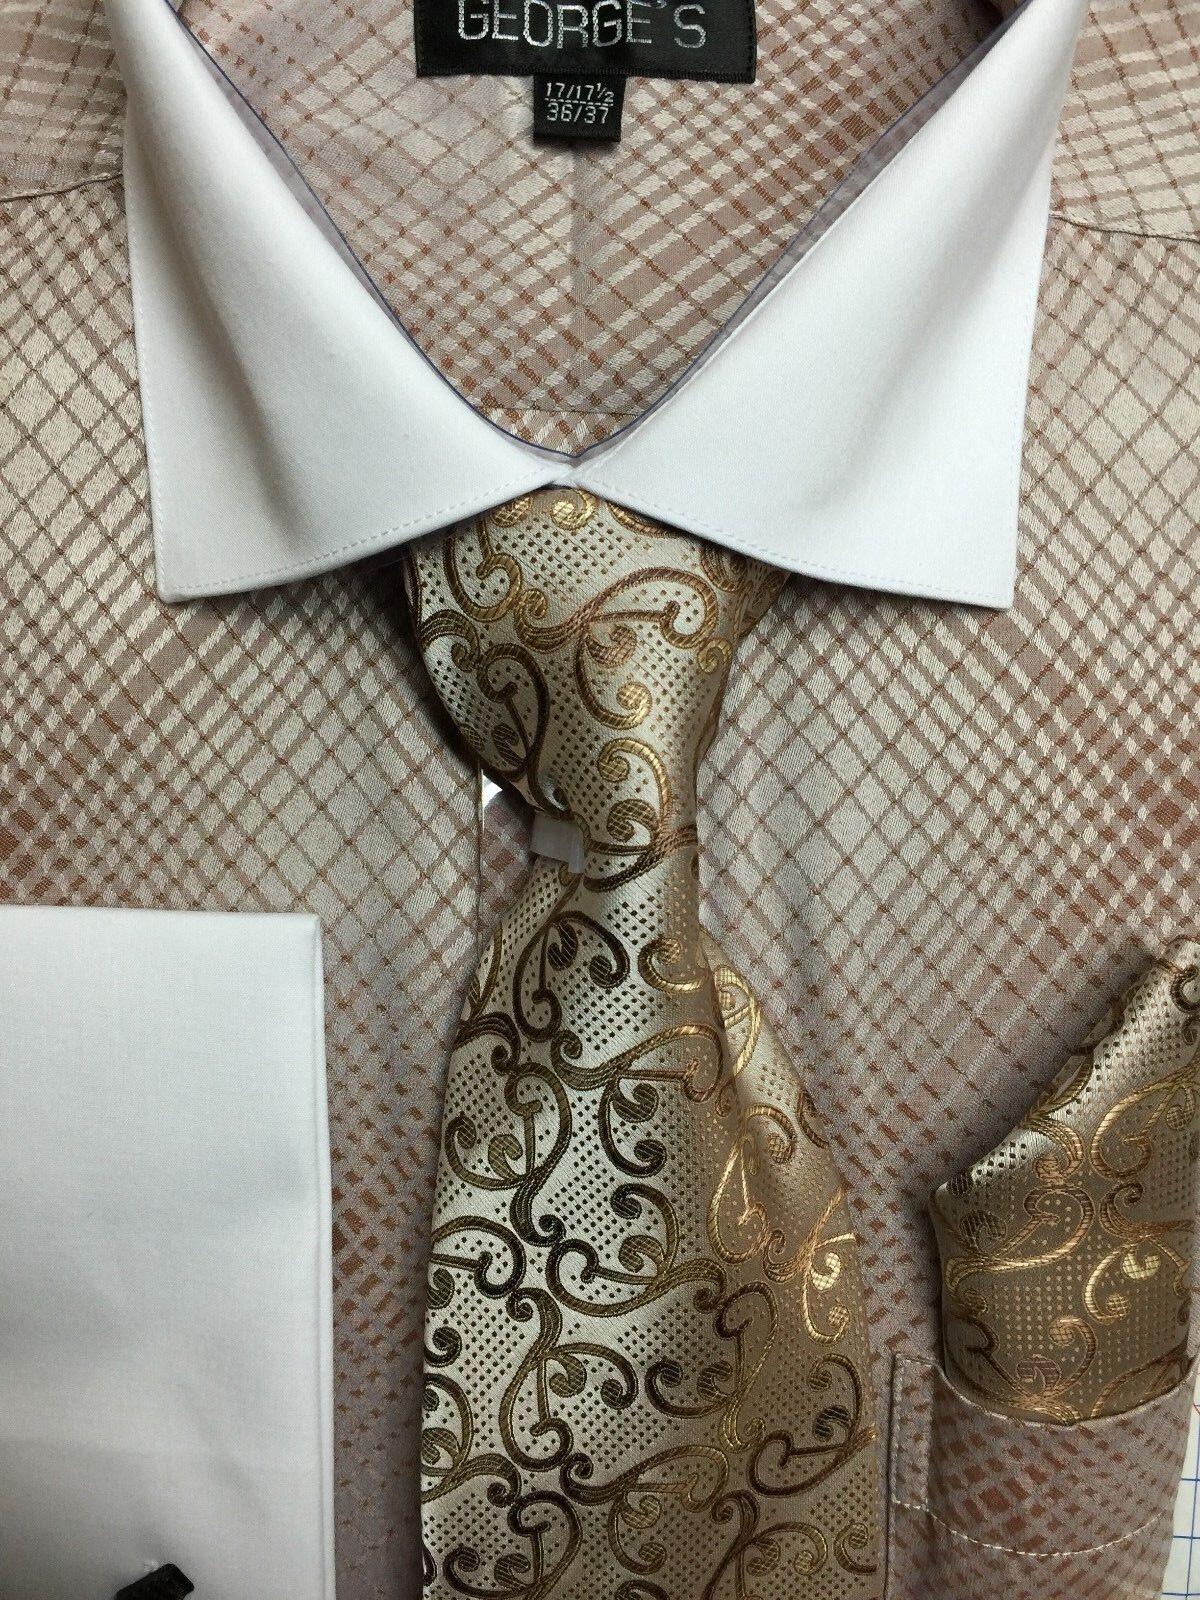 New mini plaid check design dress shirt french cuff white for New check designs